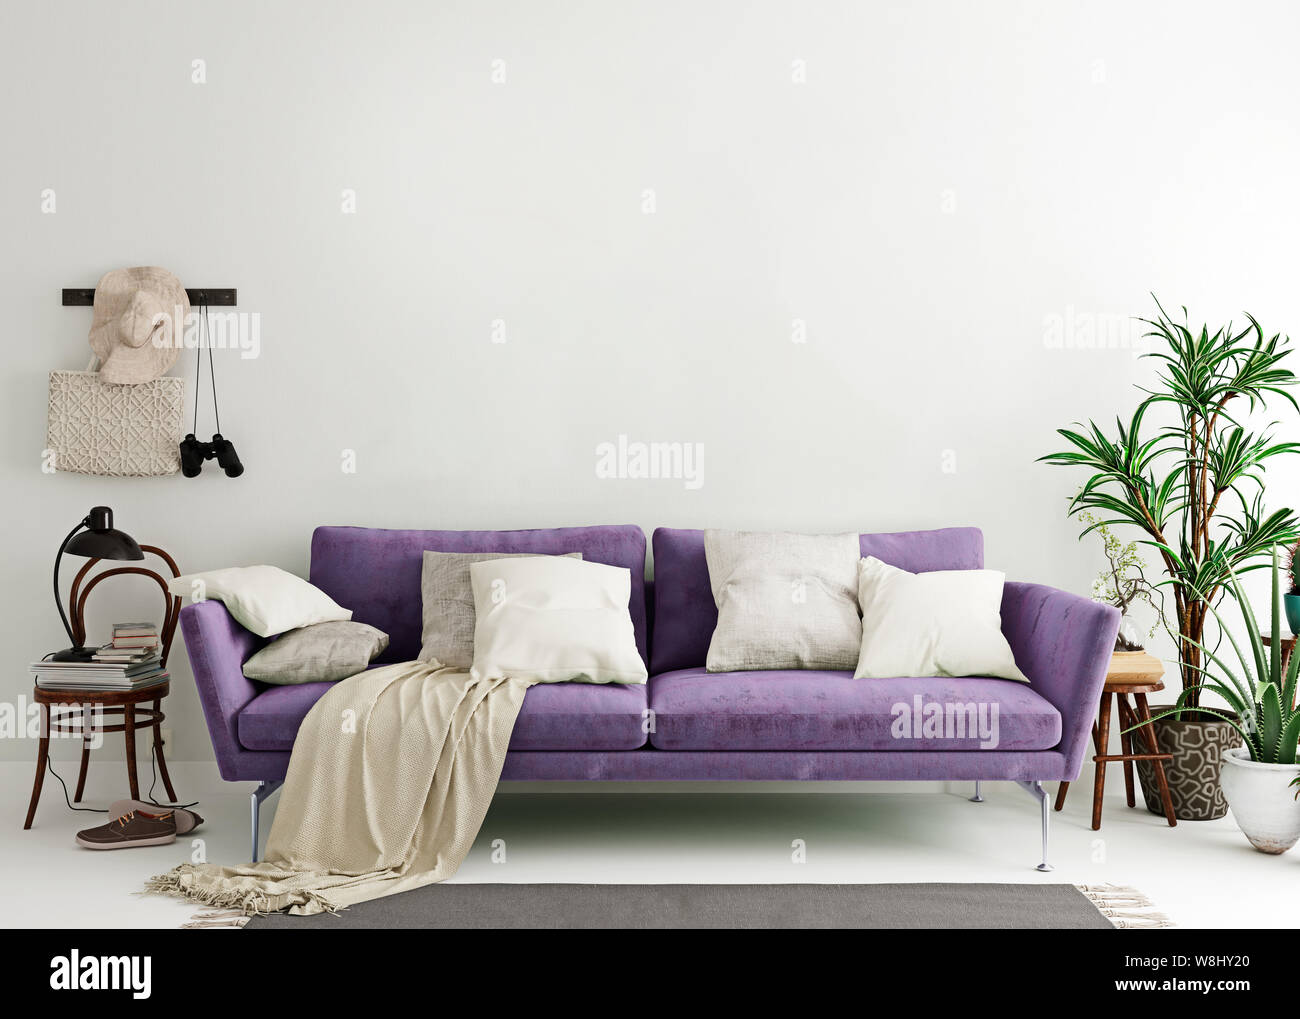 Mock up wall in purple indigo modern interior background, living room, Scandinavian style, 3D render, 3D illustration Stock Photo